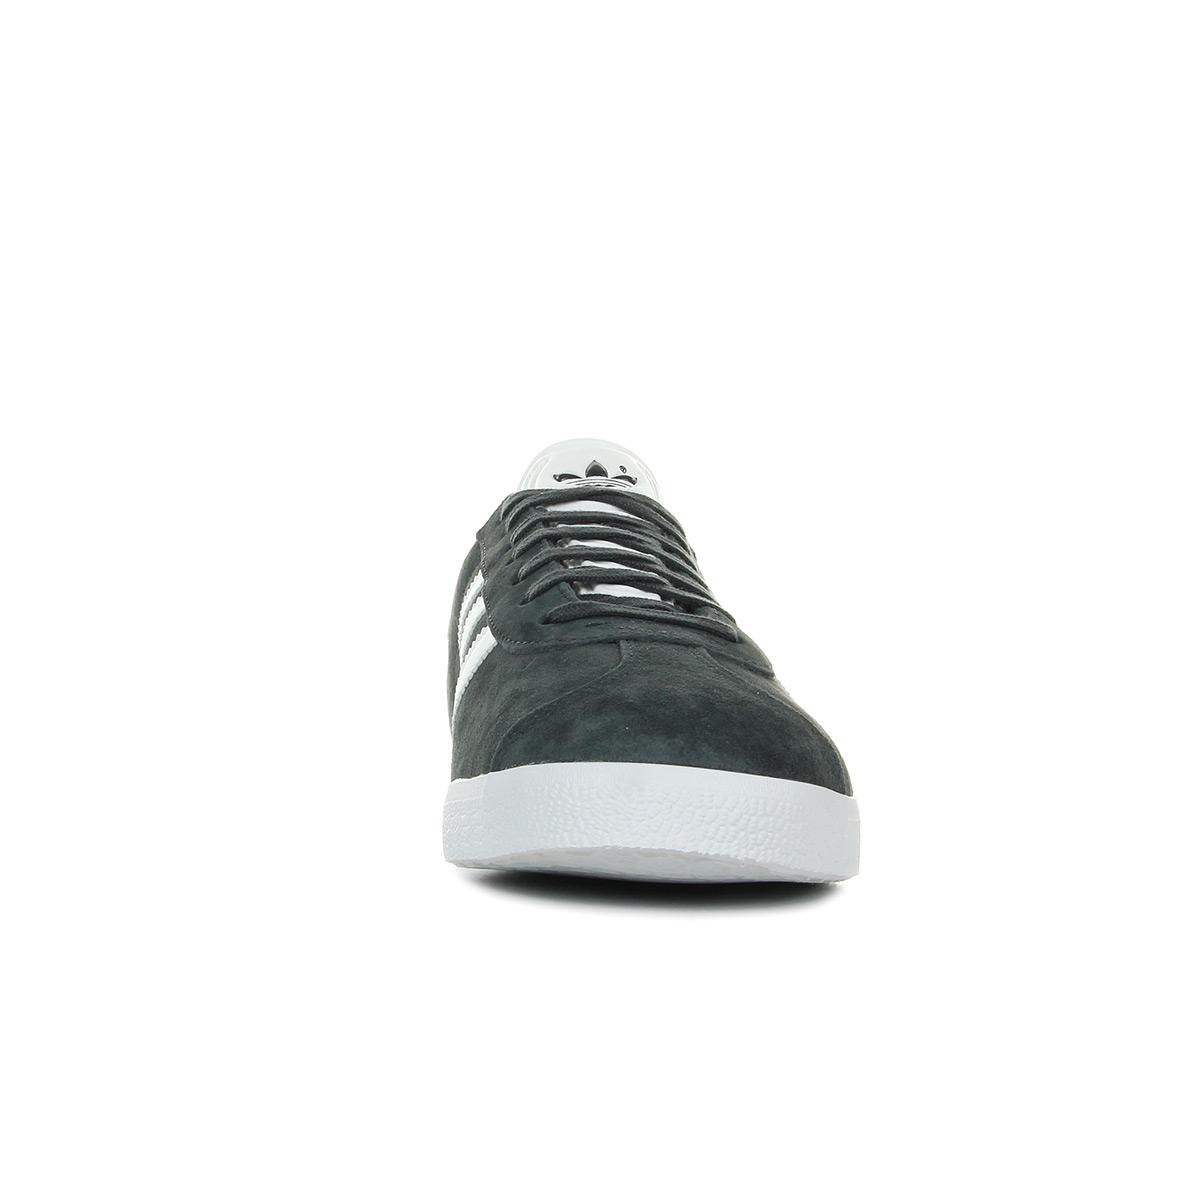 adidas Gazelle BB5480, Baskets mode